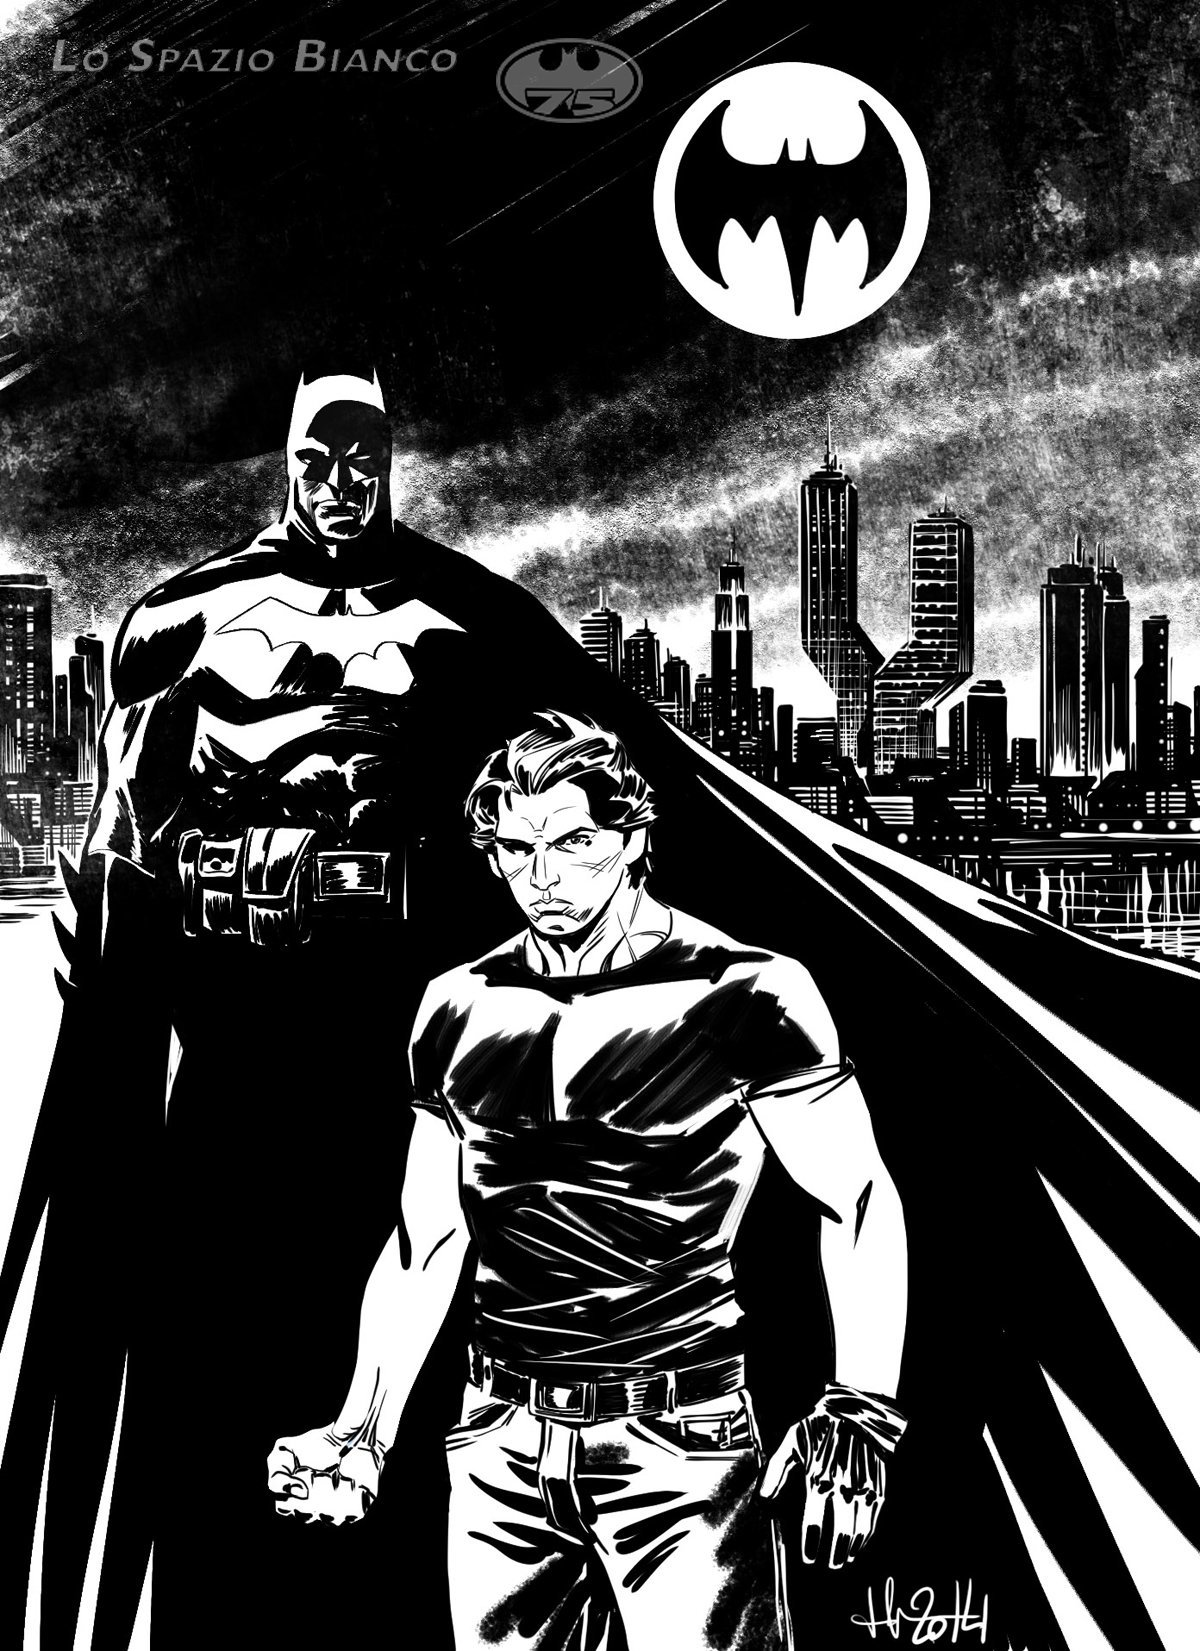 Batman & Lukas_Luca Casalanguida